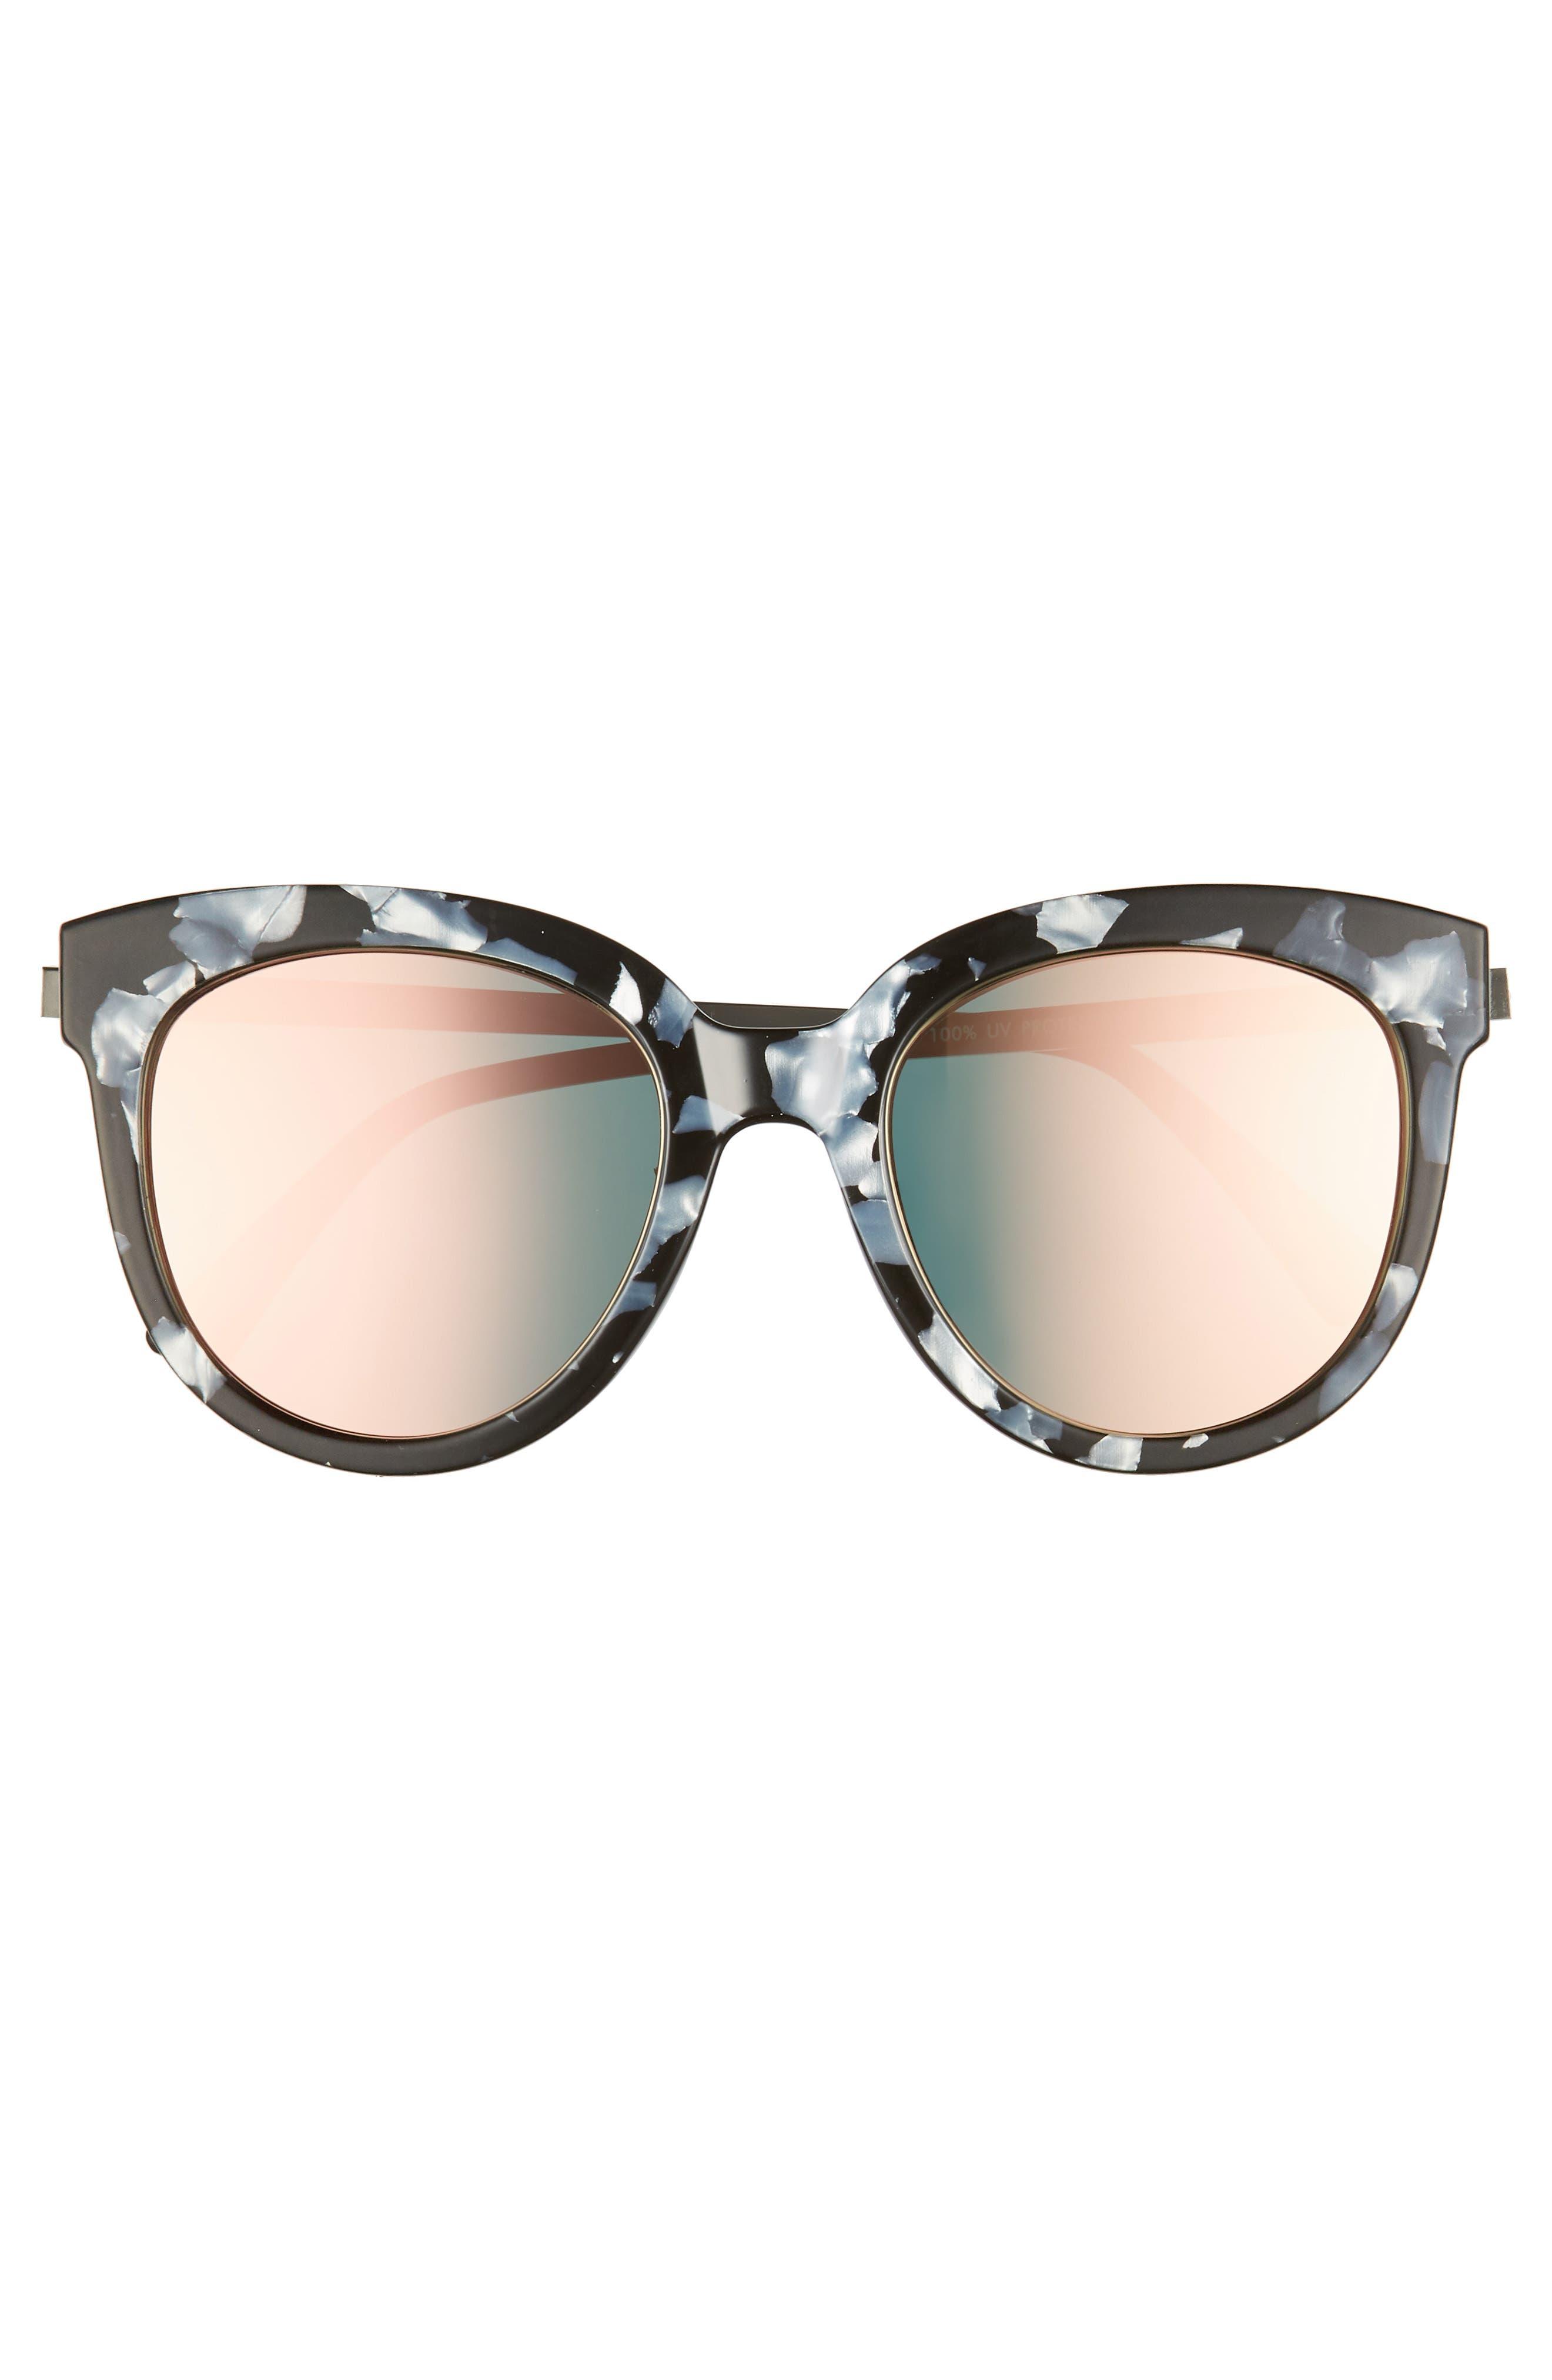 50mm Flat Cat Eye Sunglasses,                             Alternate thumbnail 3, color,                             BLACK ACIDE PINK